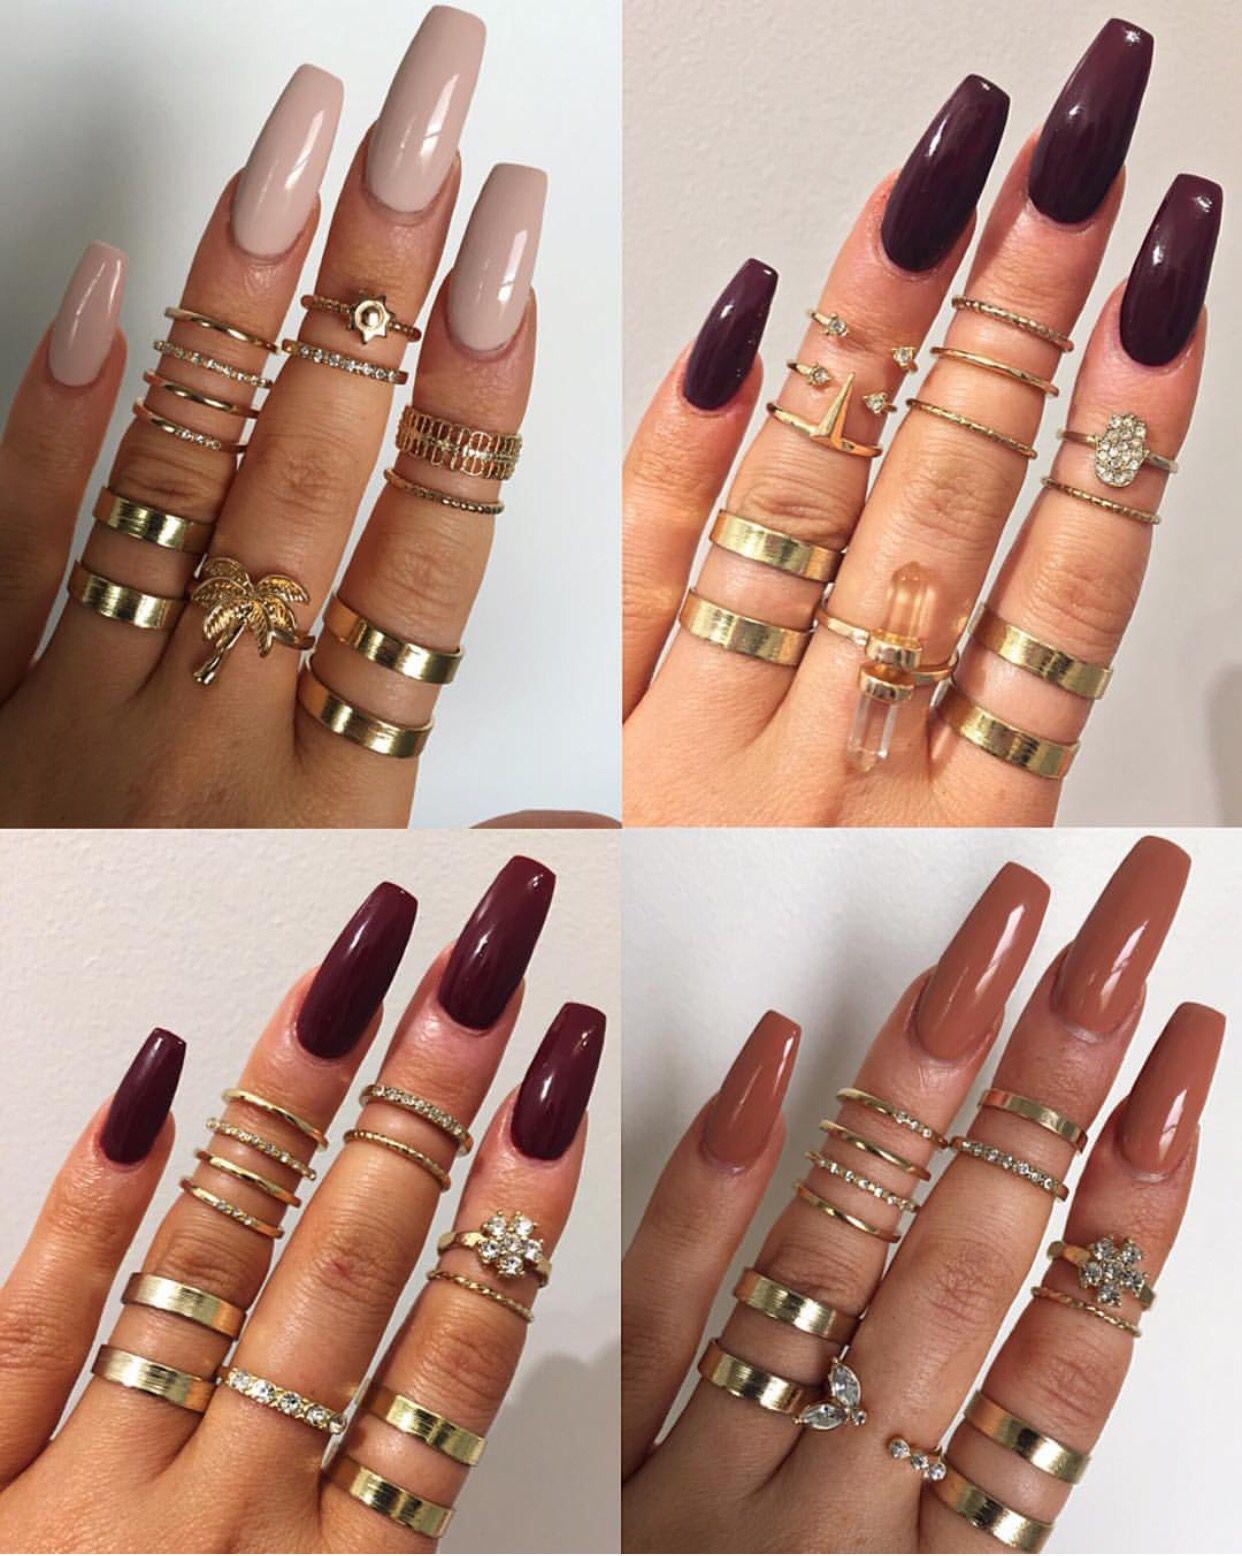 Ig Victoriaoliviaxo Fall Colors Pretty Nails Nails Inspiration Beautiful Nails